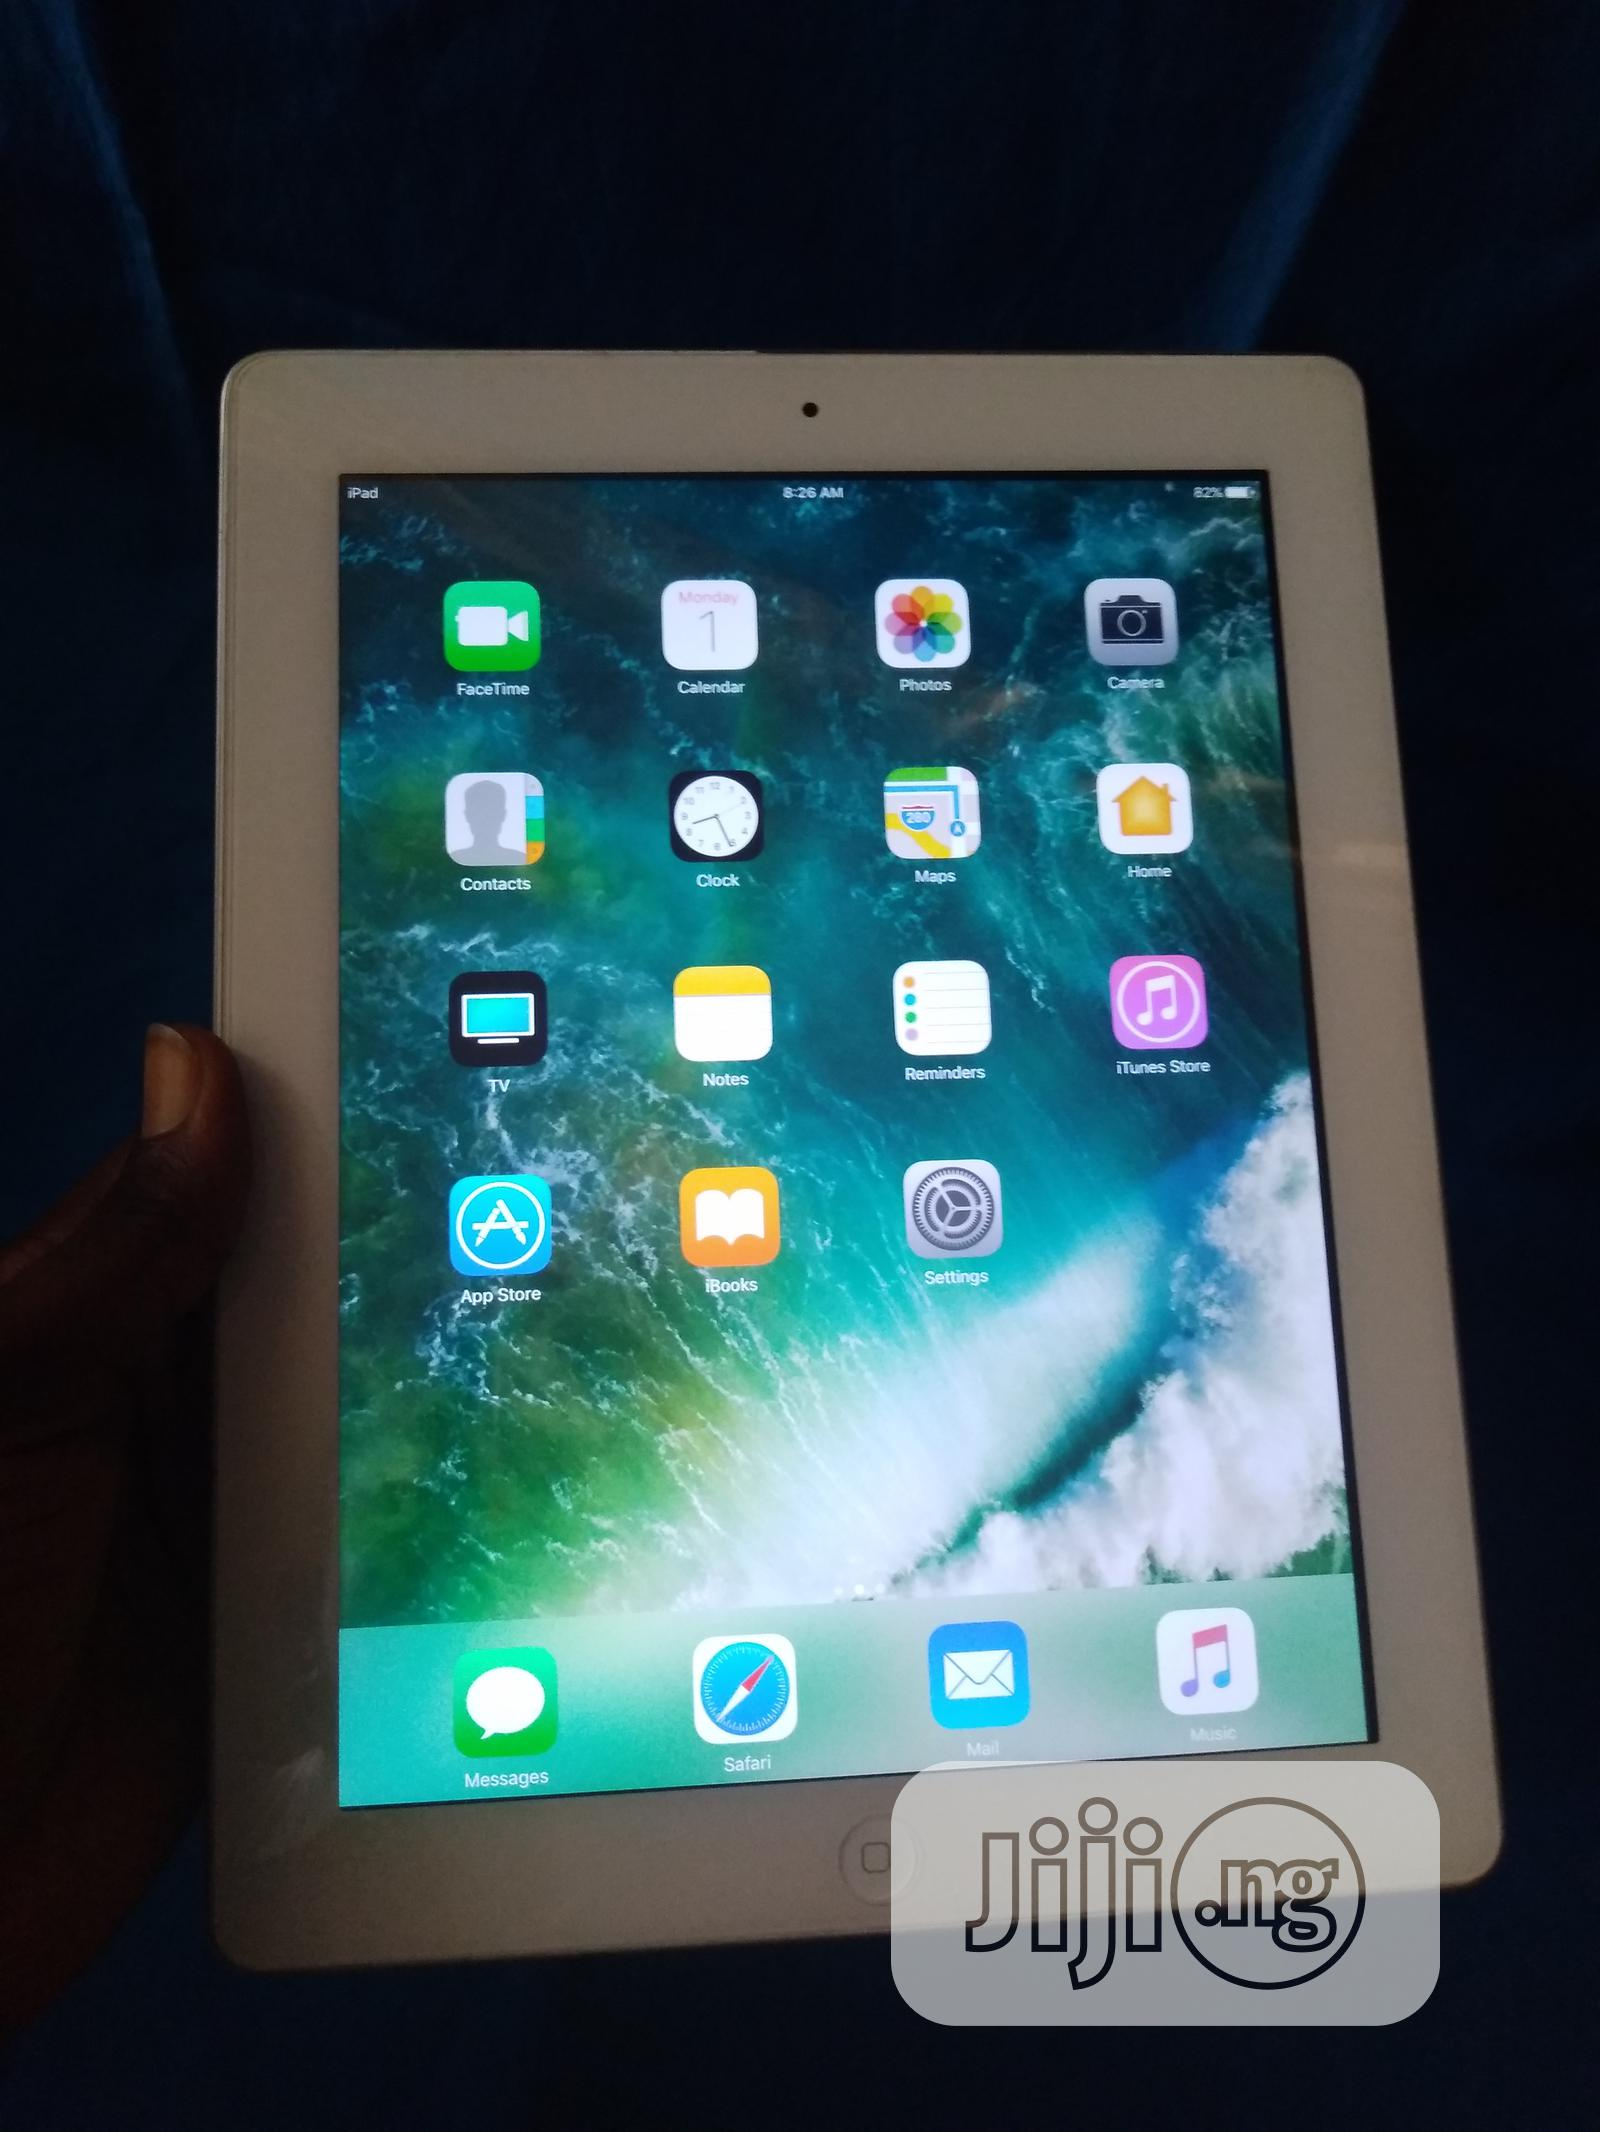 Apple iPad 3 Wi-Fi + Cellular 16 GB Silver